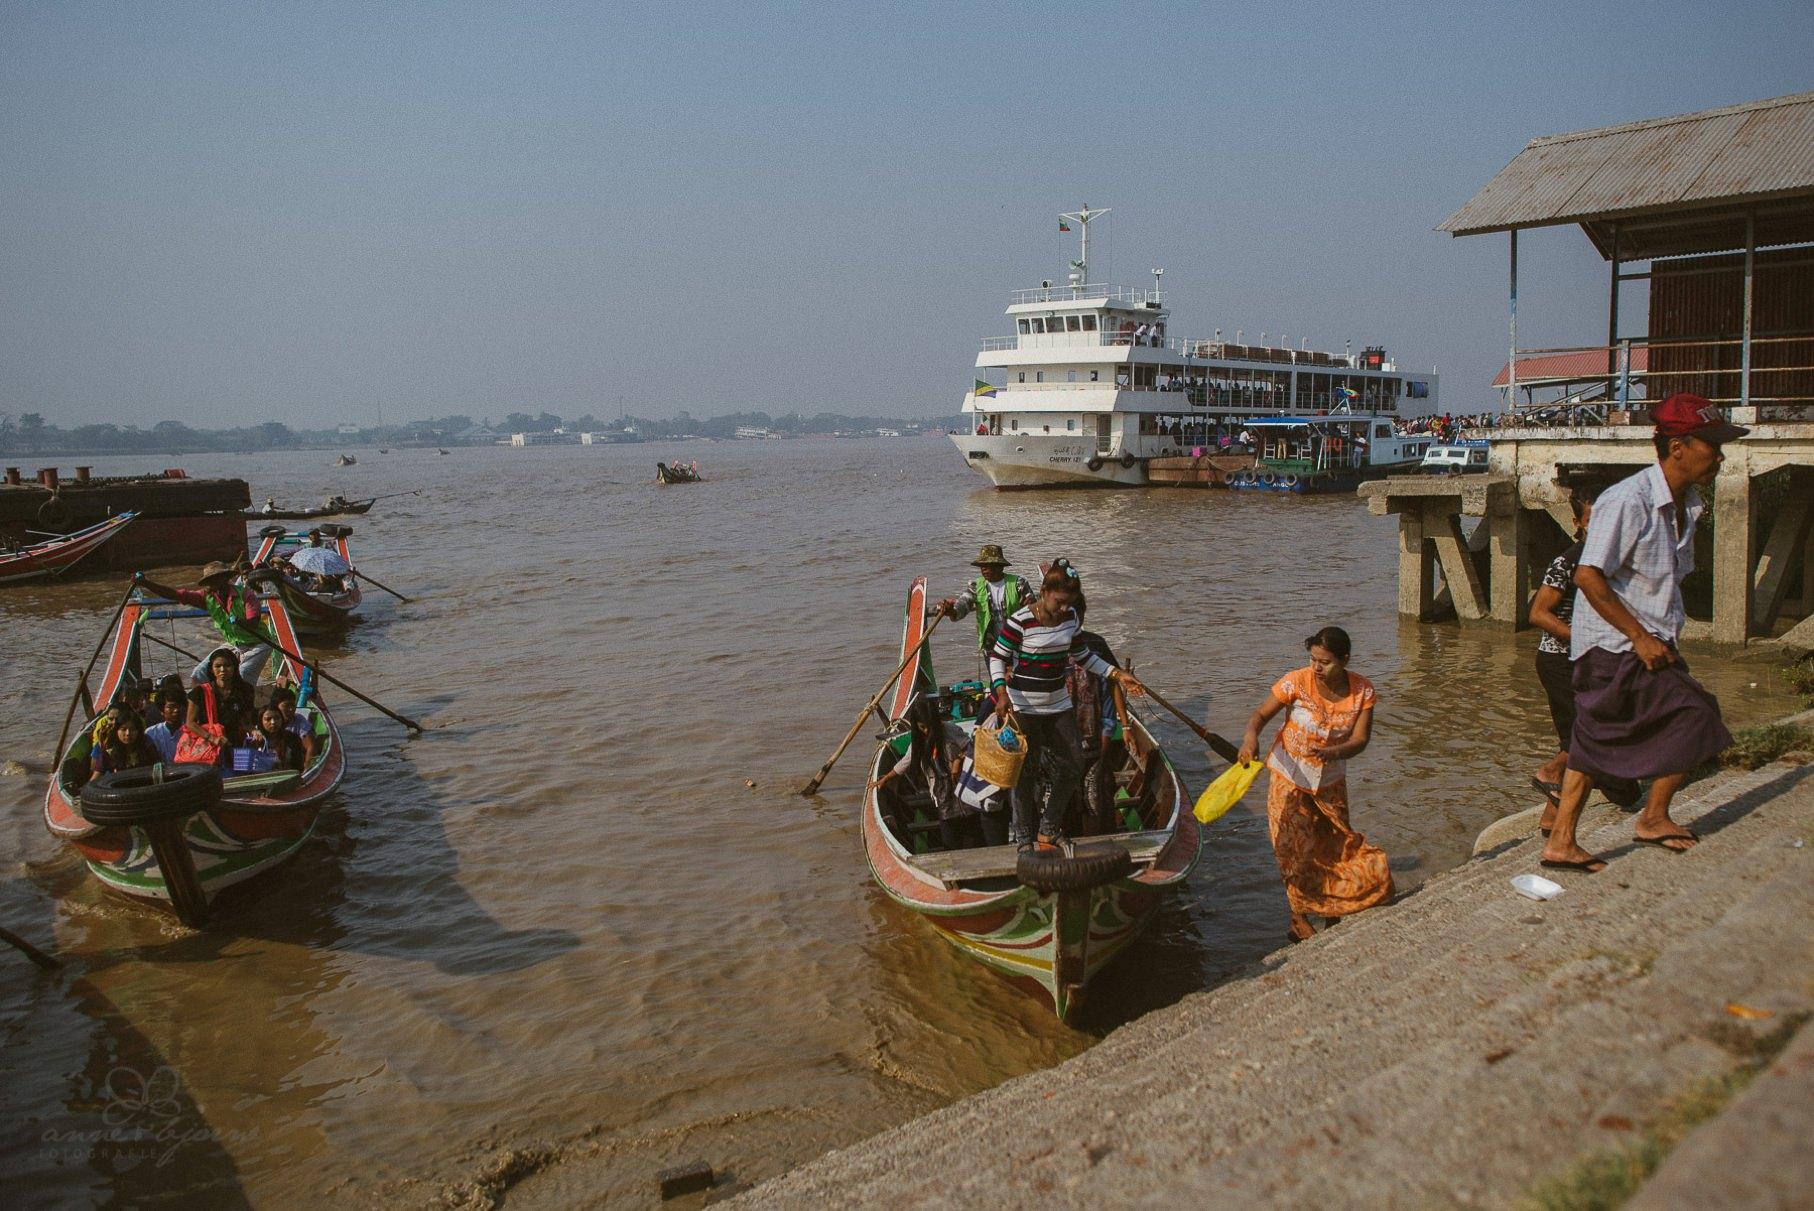 0005 yangon mandalay d76 4220 - Großstädte Myanmars - Yangon & Mandalay